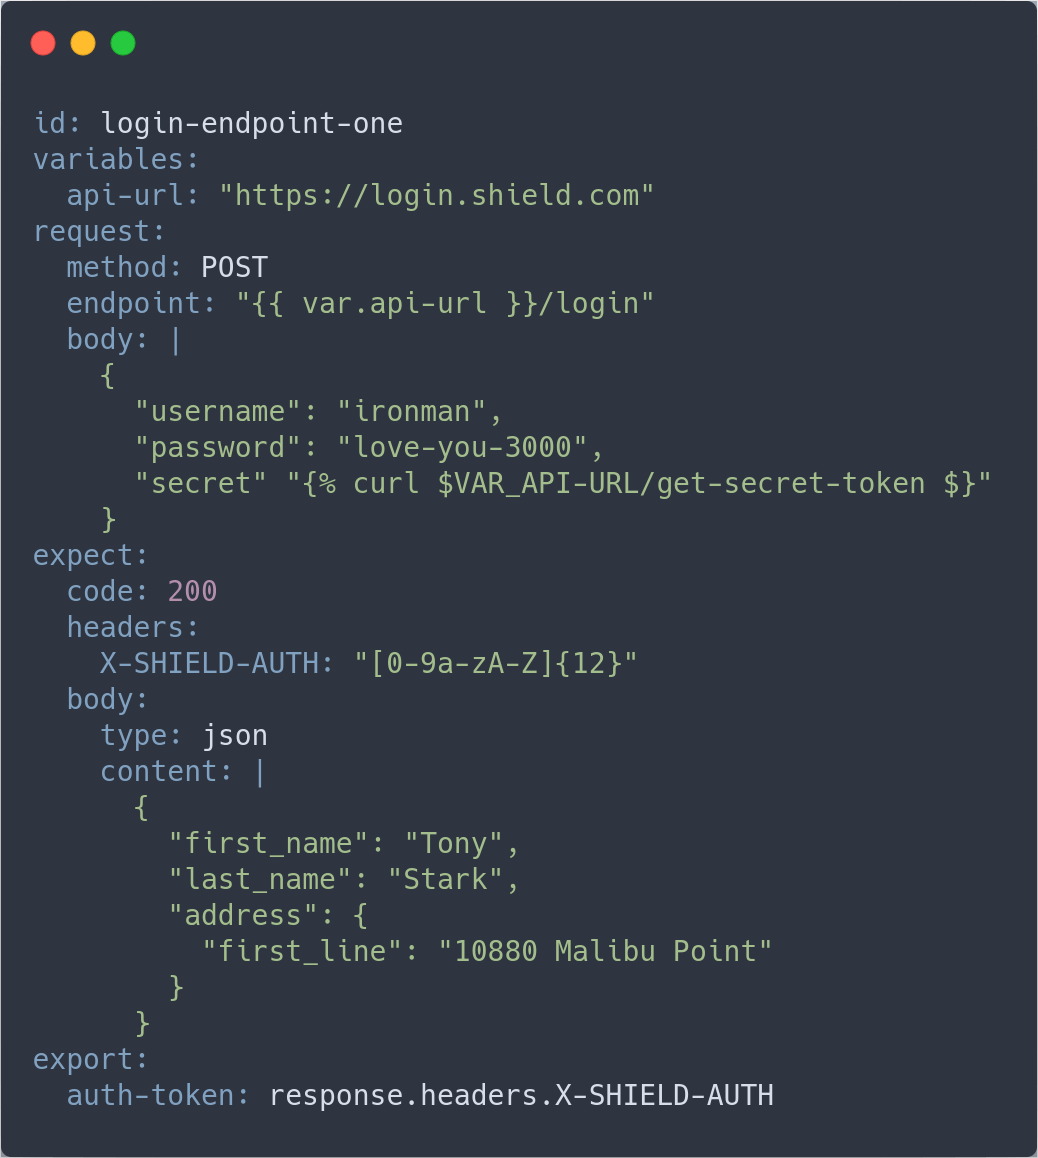 image code representing fixing bugs